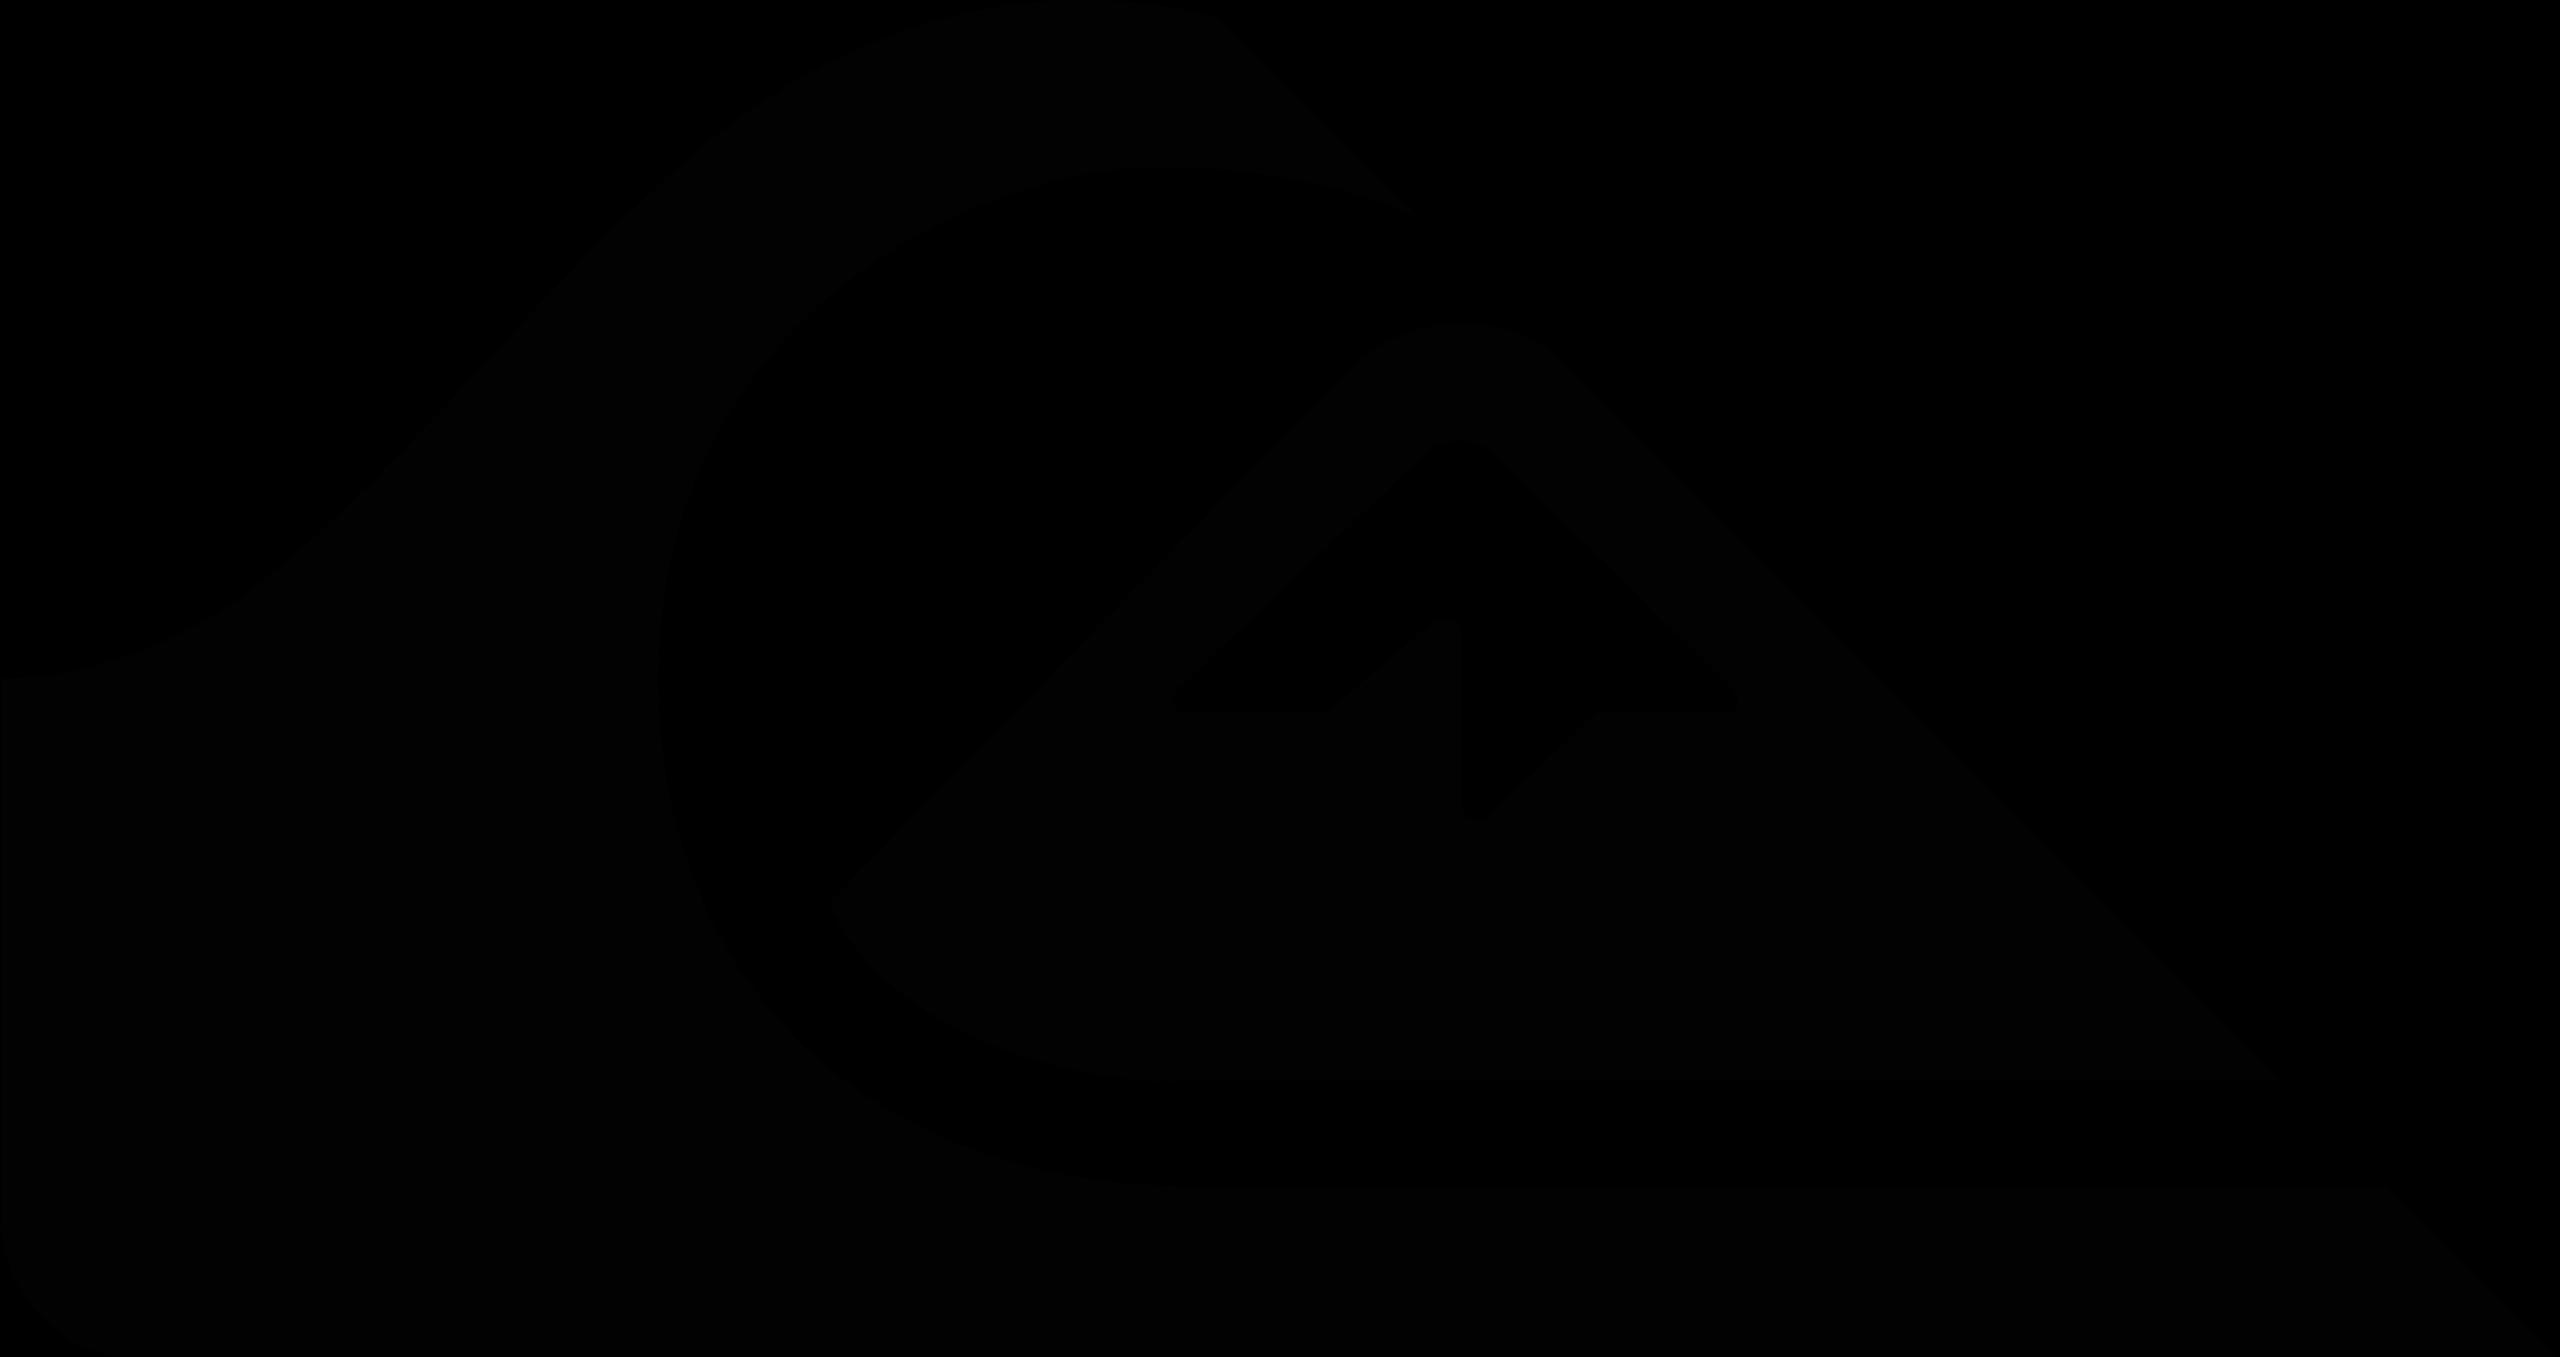 Logo Quiksilver. Sumber gambar: wikimedia.org